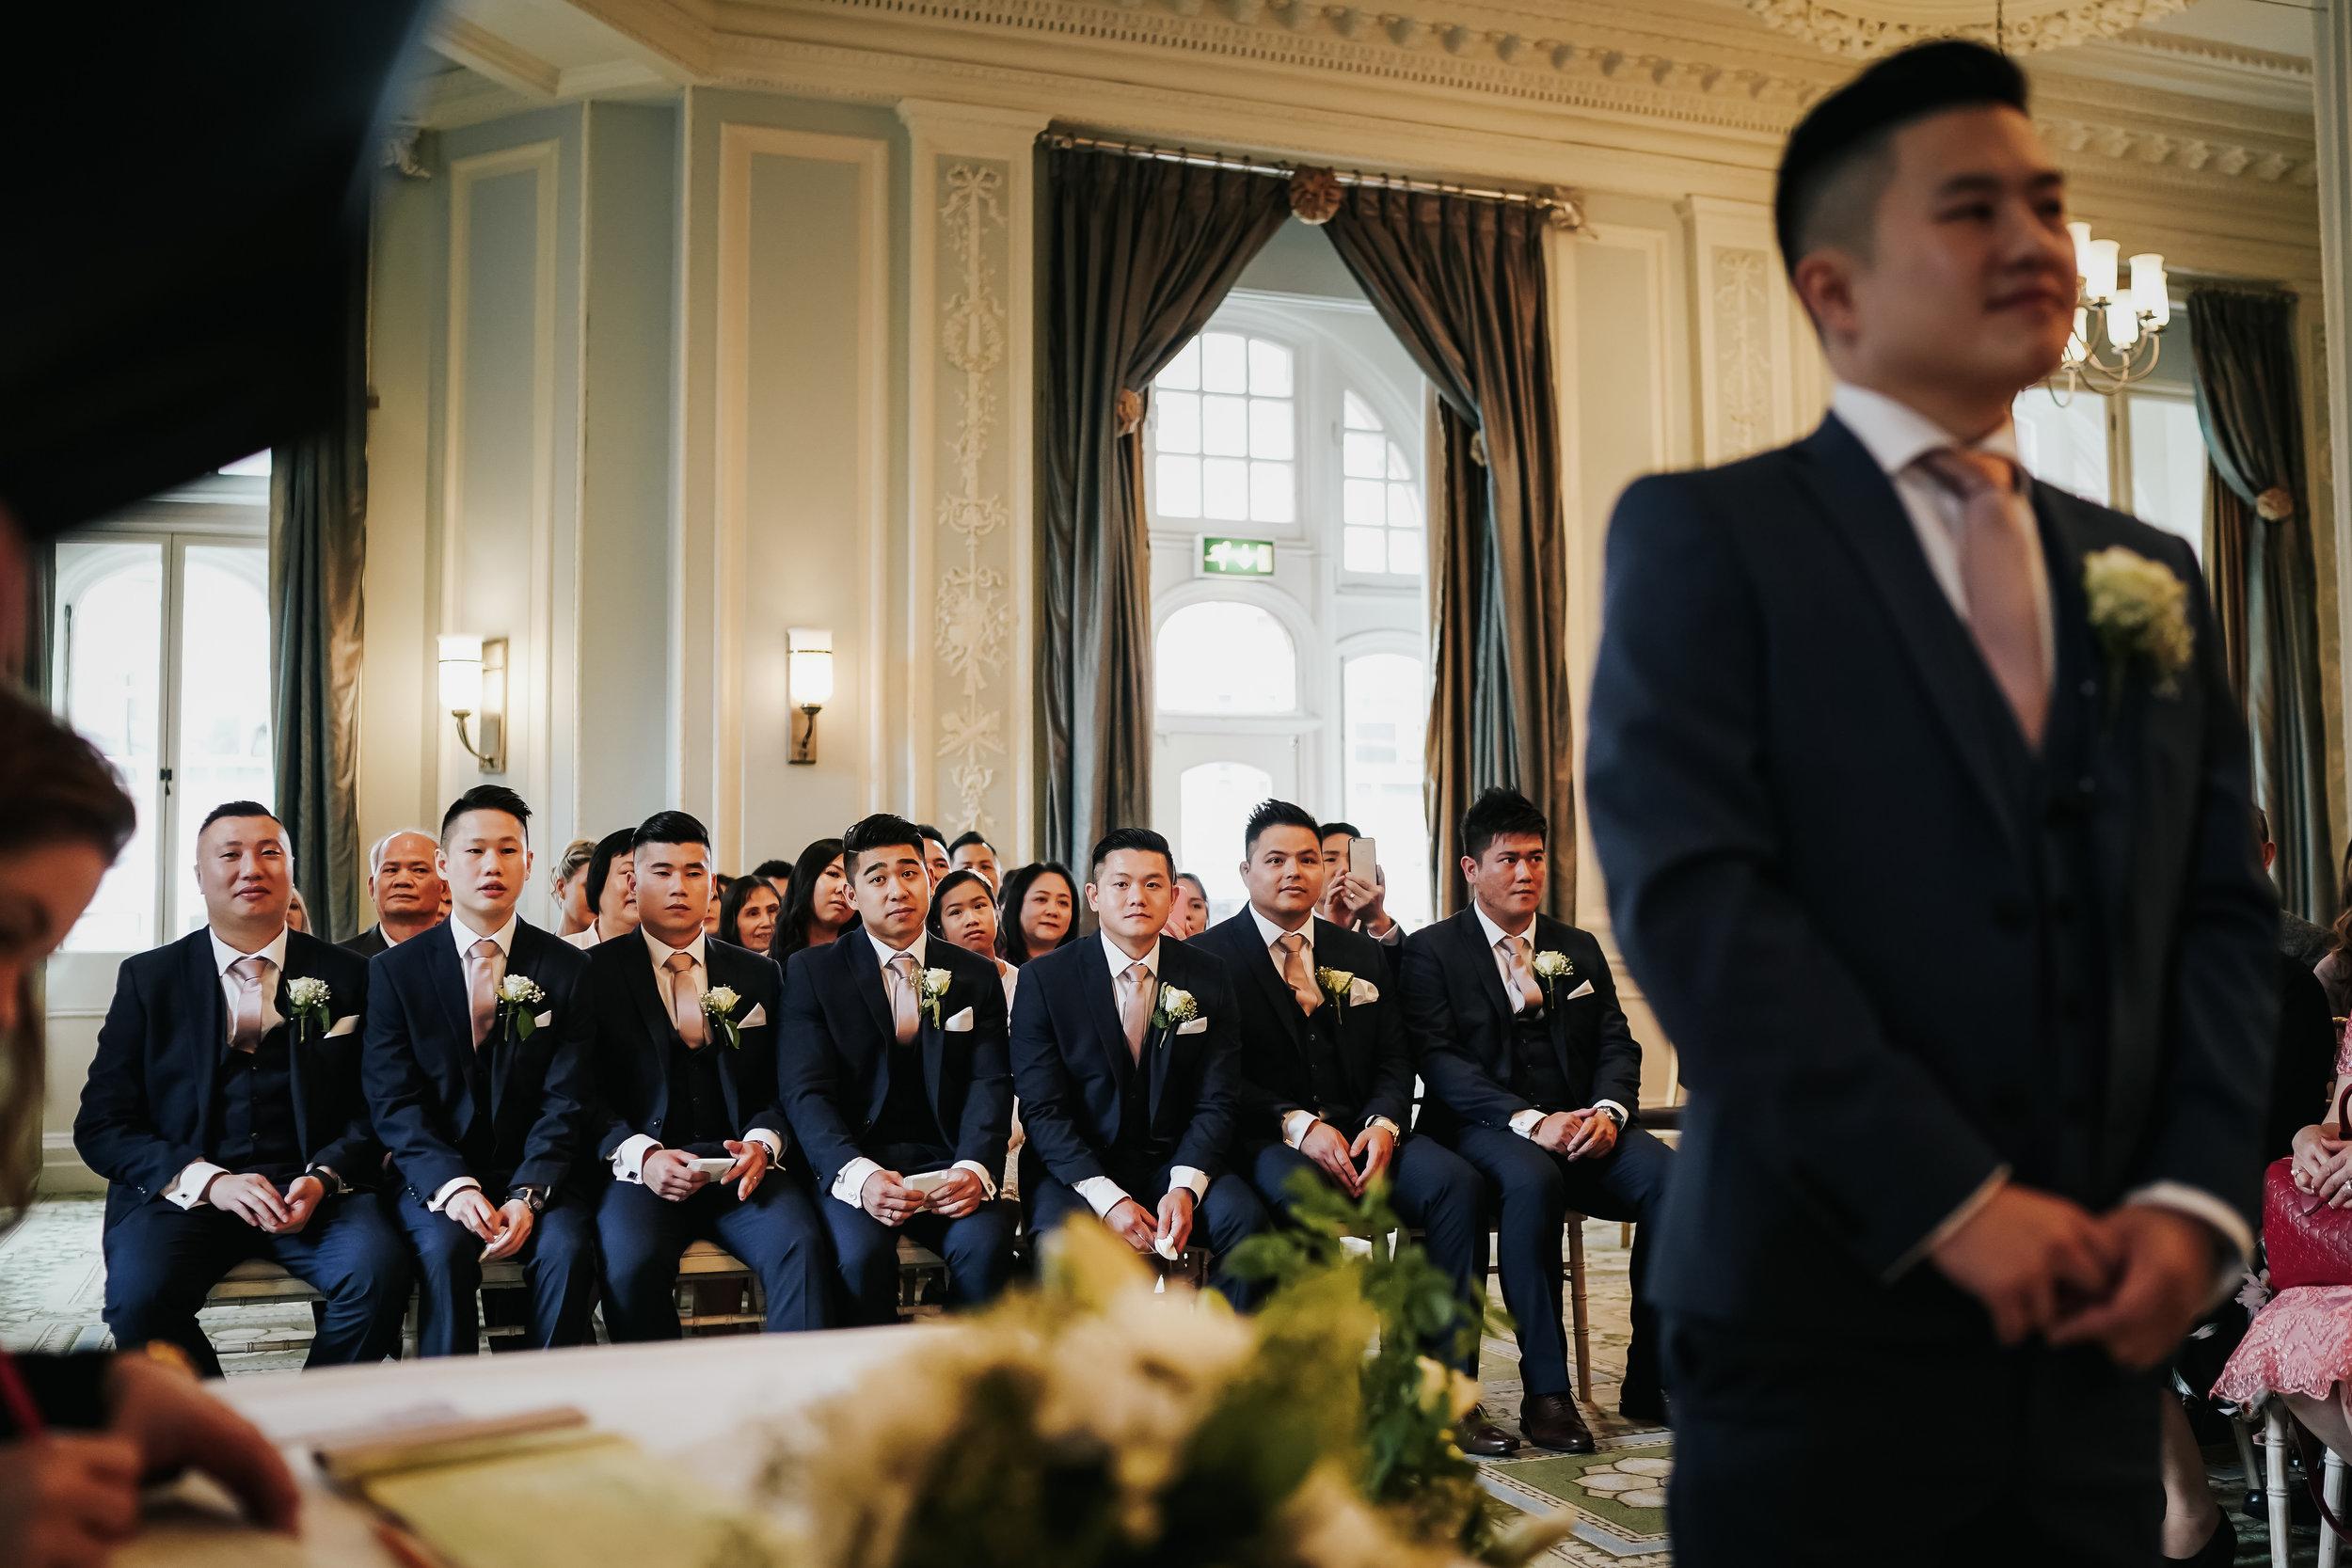 Chinese Wedding Photography Manchester wedding photographer Cheshire - 019.jpg